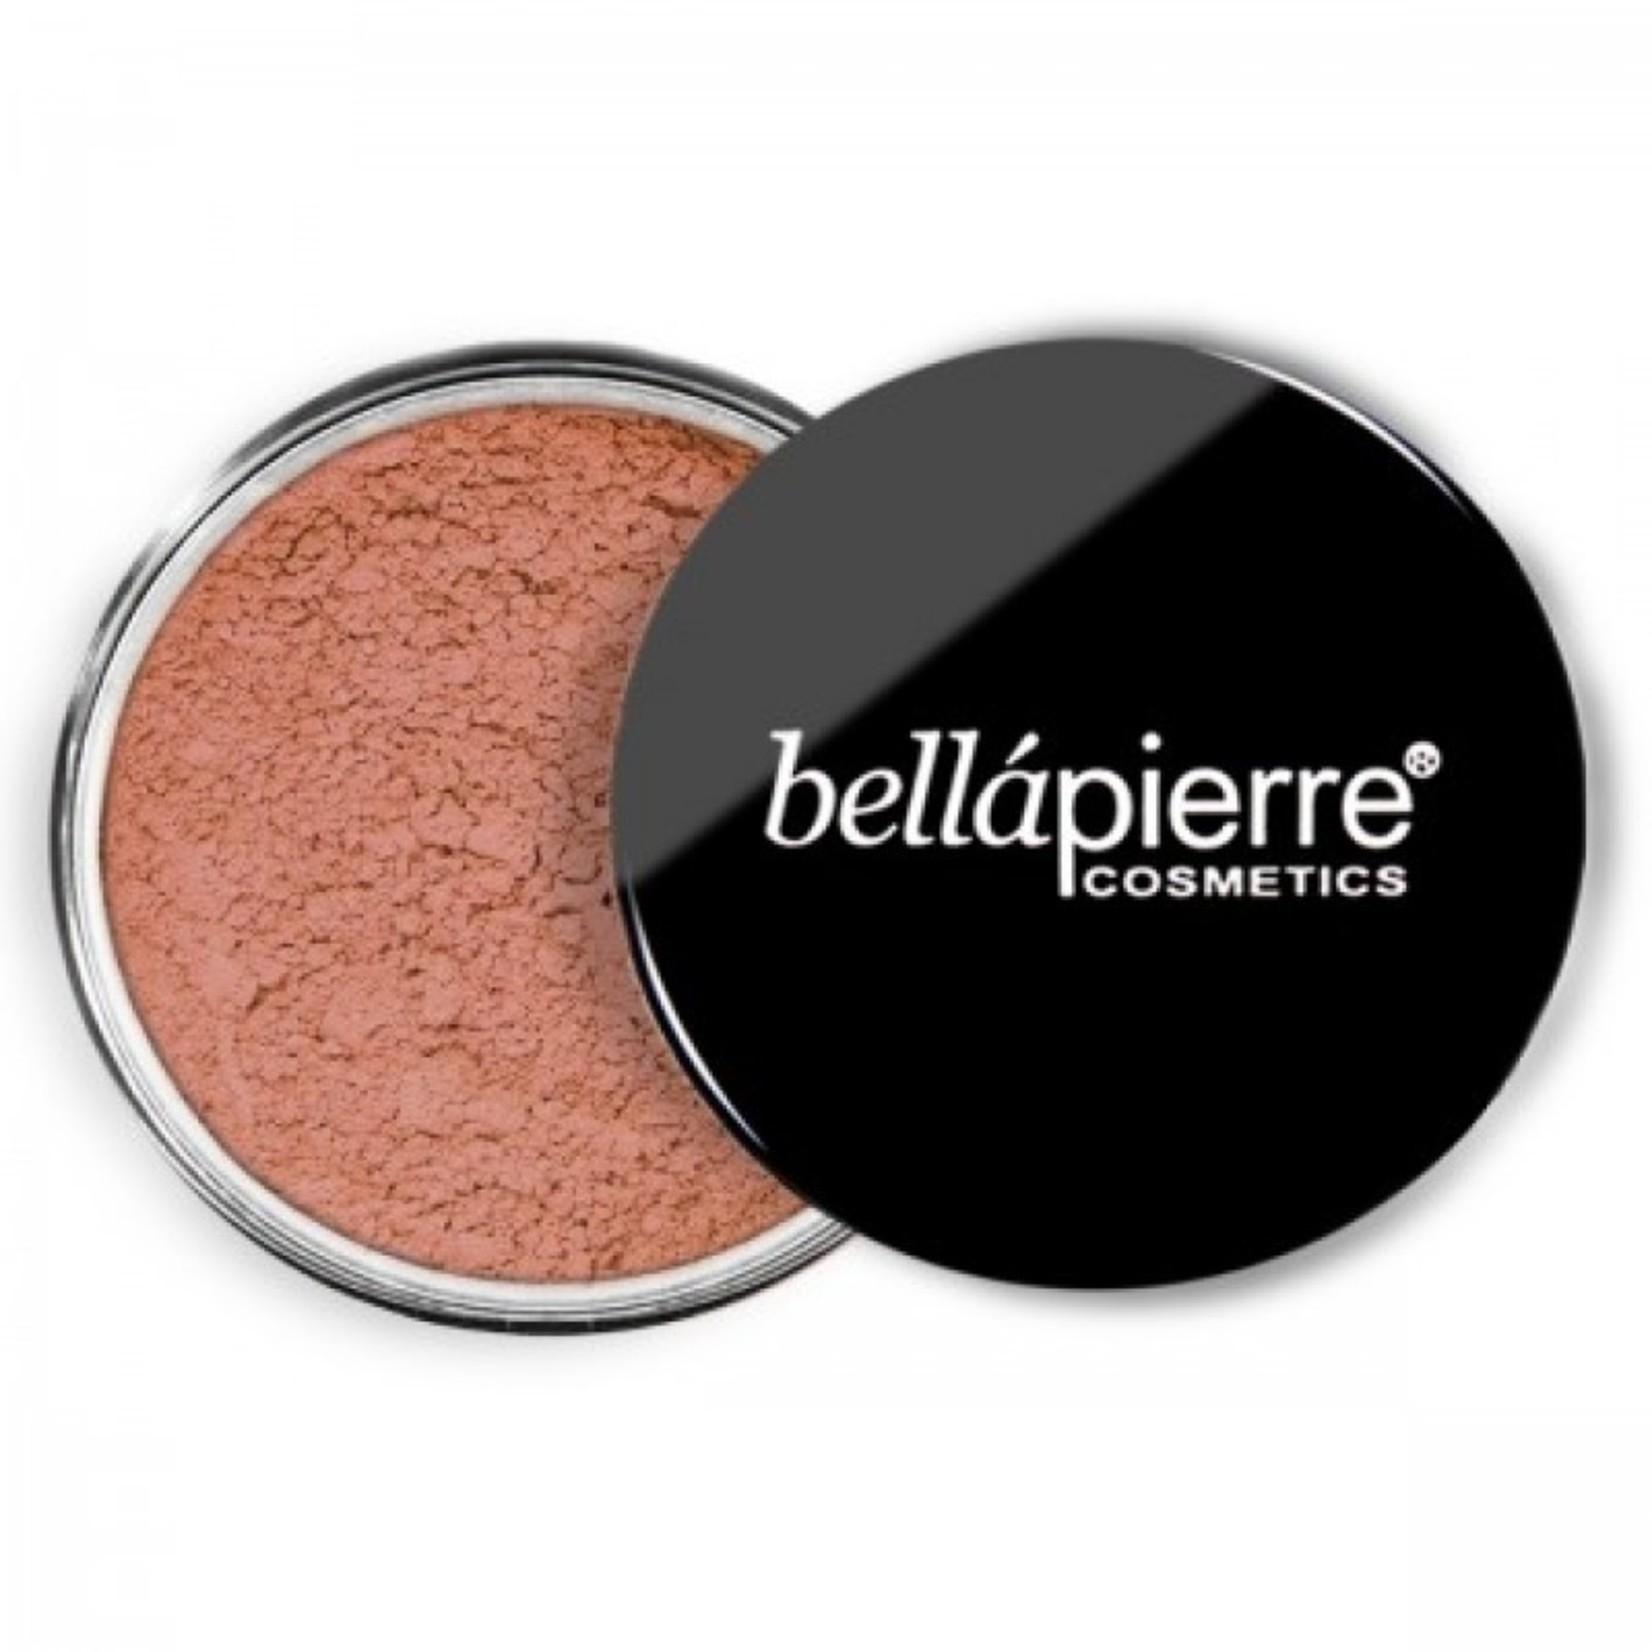 Bellapierre Mineral loose blush - Suede